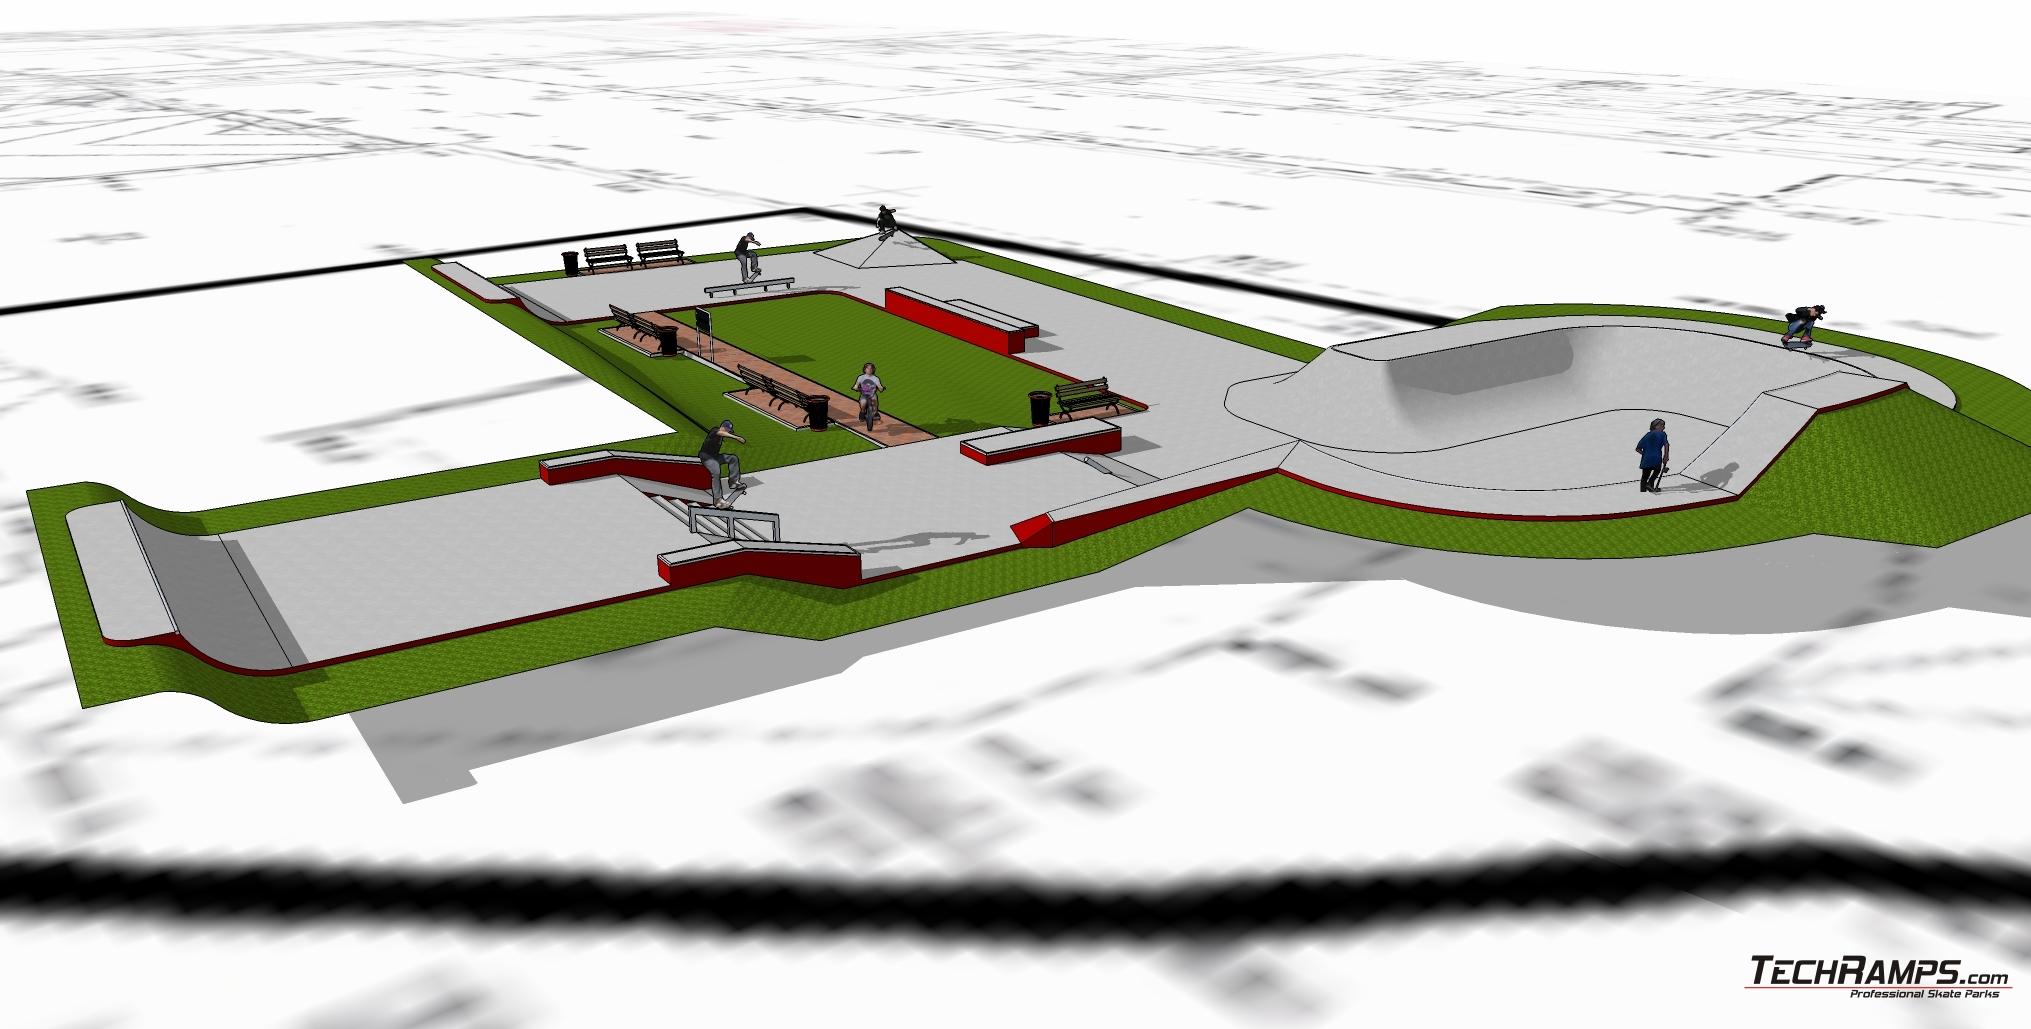 Betonowy skatepark w Opolu - projekt Techramps